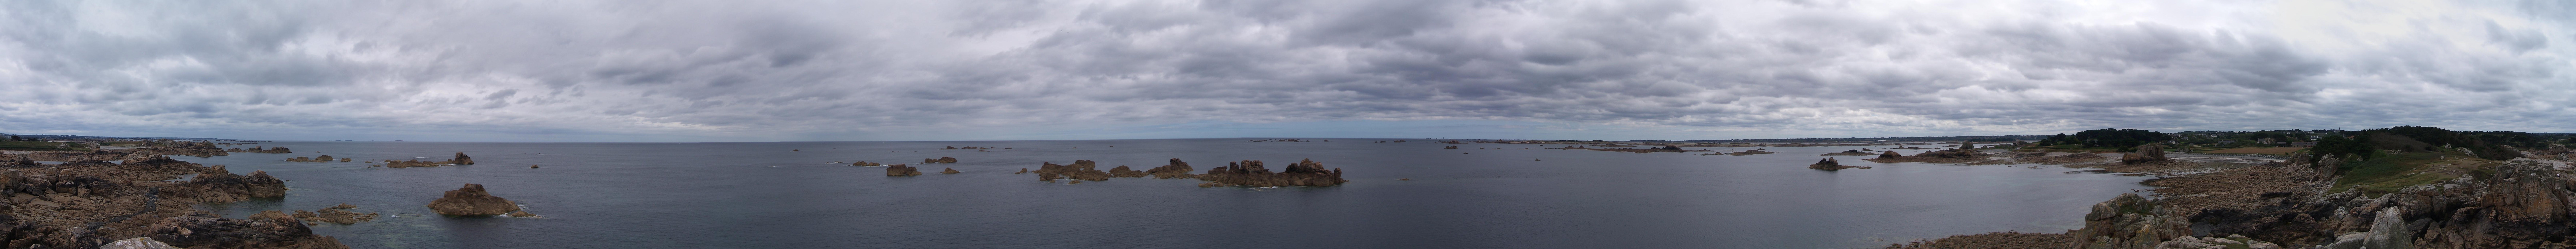 Panorama: Côte de granit